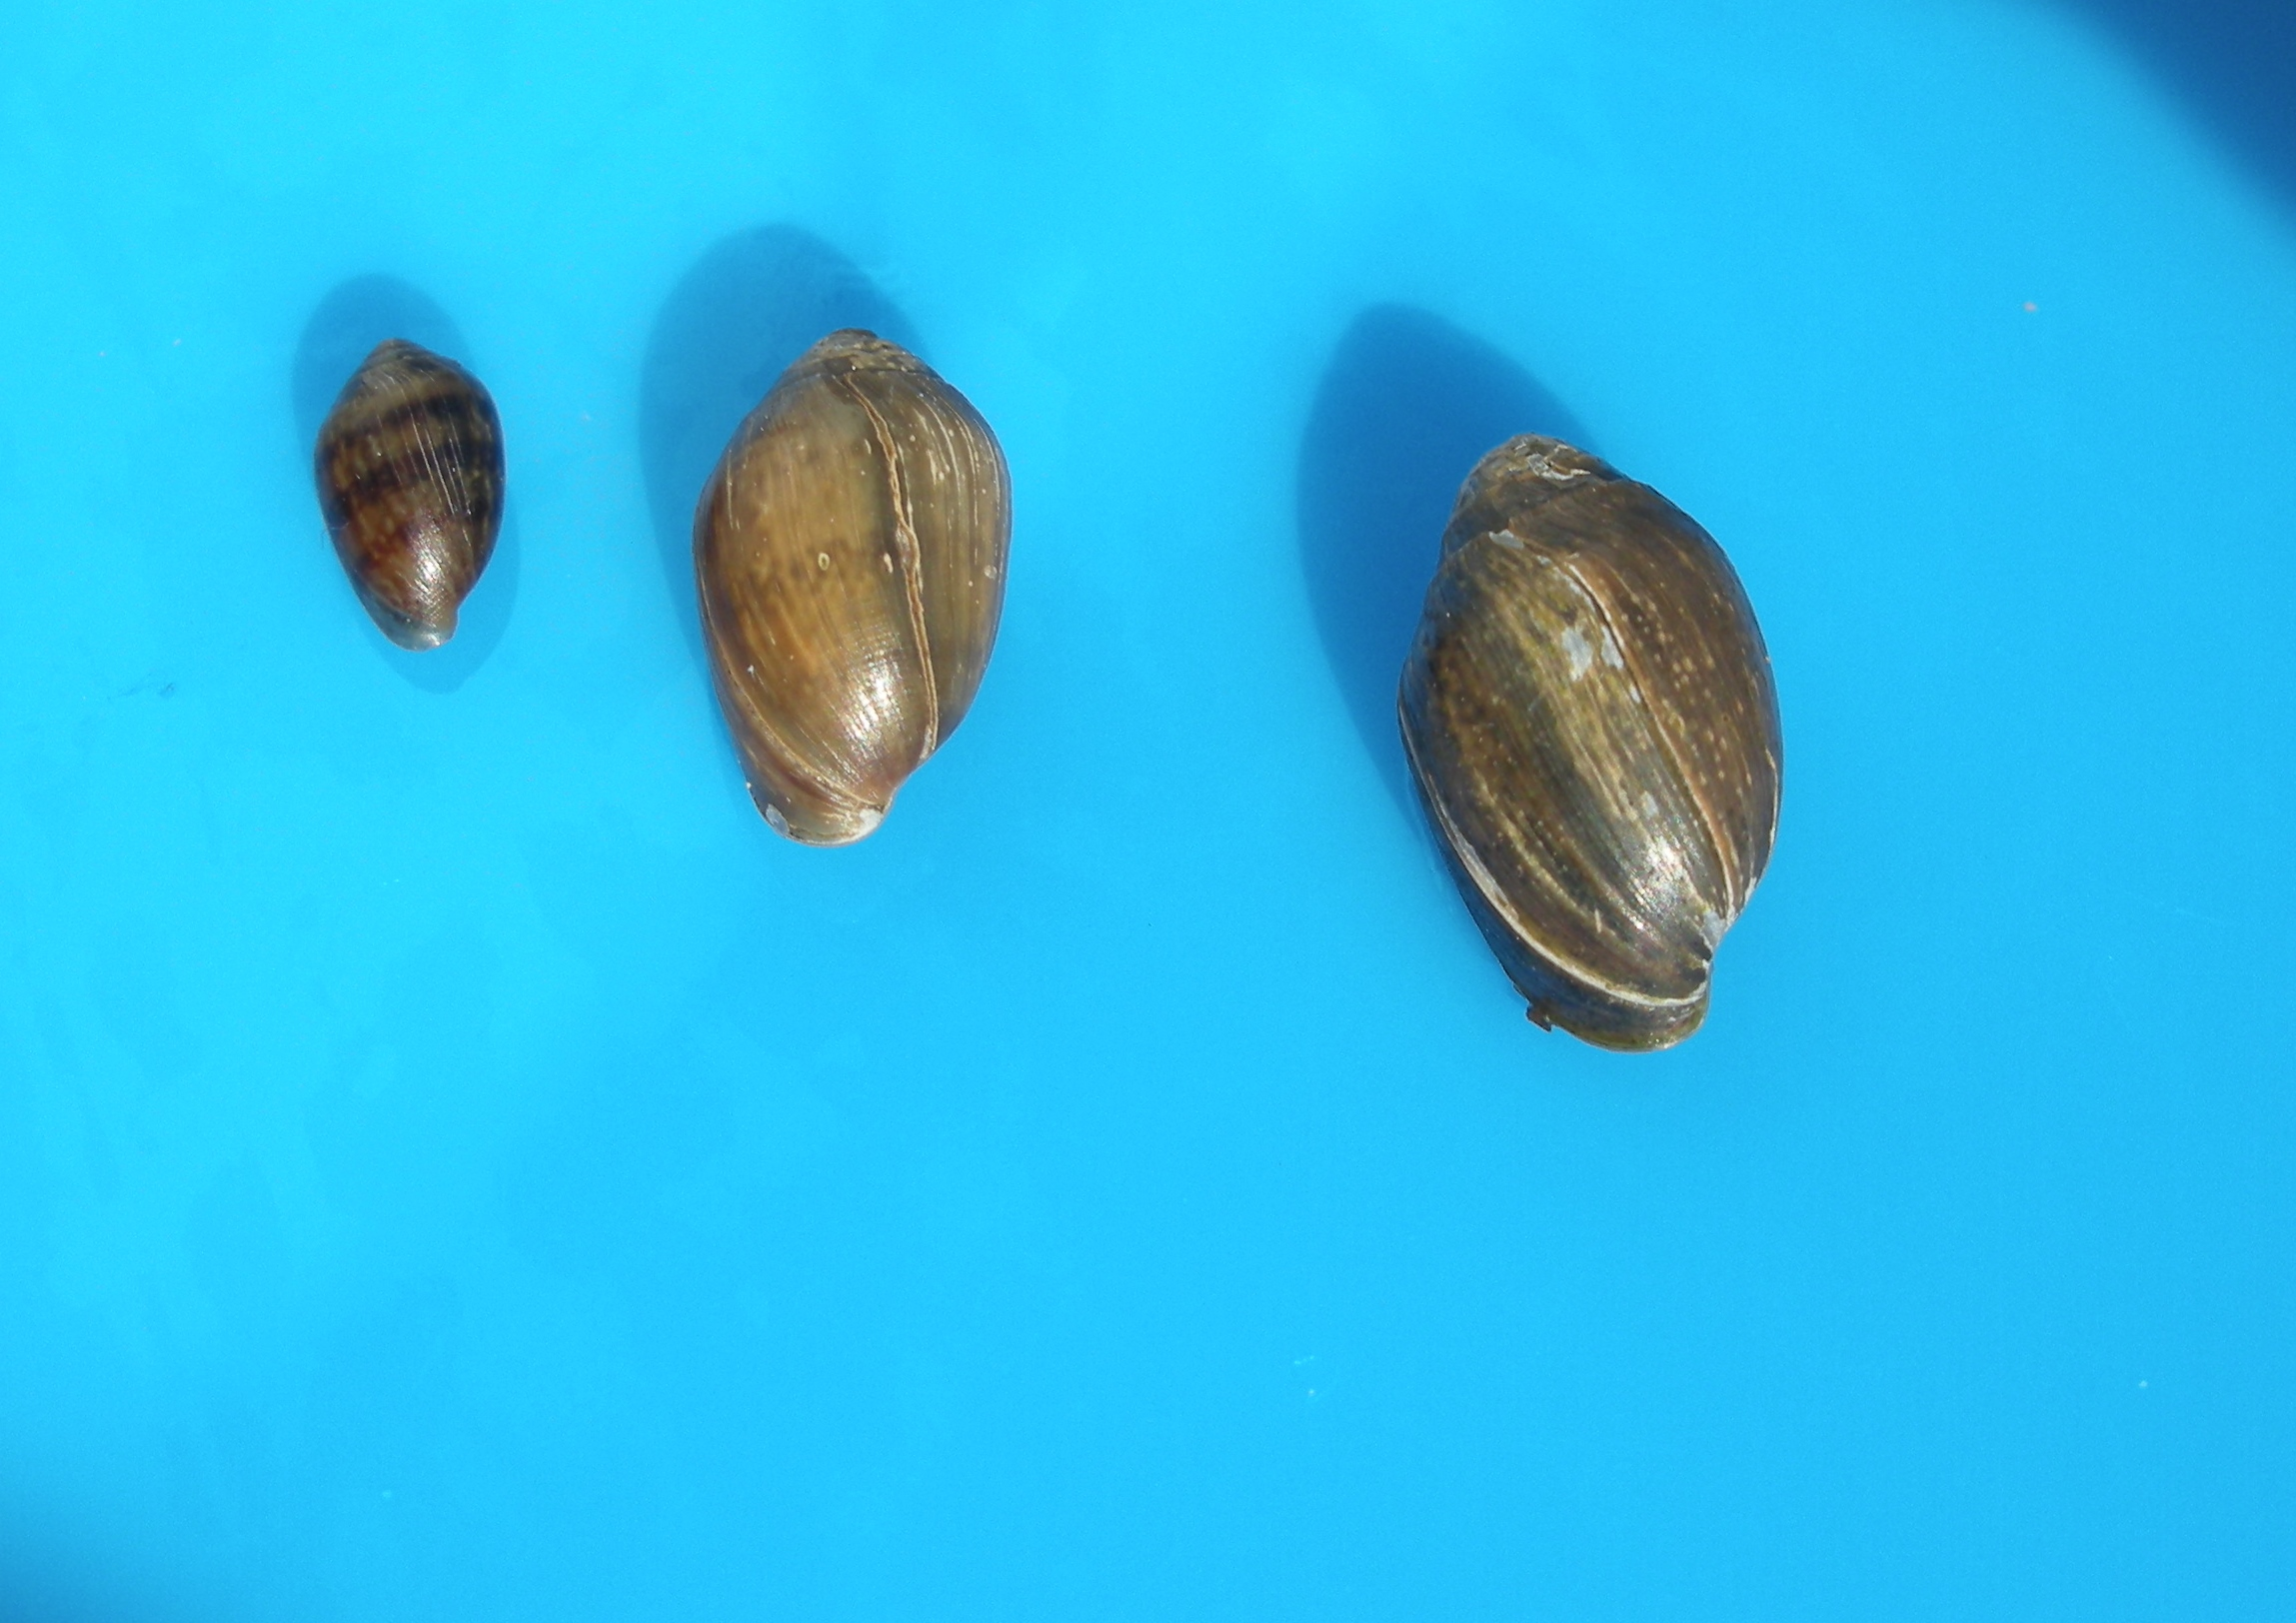 melampus coffeus the coffee bean snail Preparasi kromosom teknik jaringan padat preparsi kromosom tujuan untuk mengetahui bentuk, ukuran dan jumlah kromosom dari suatu.